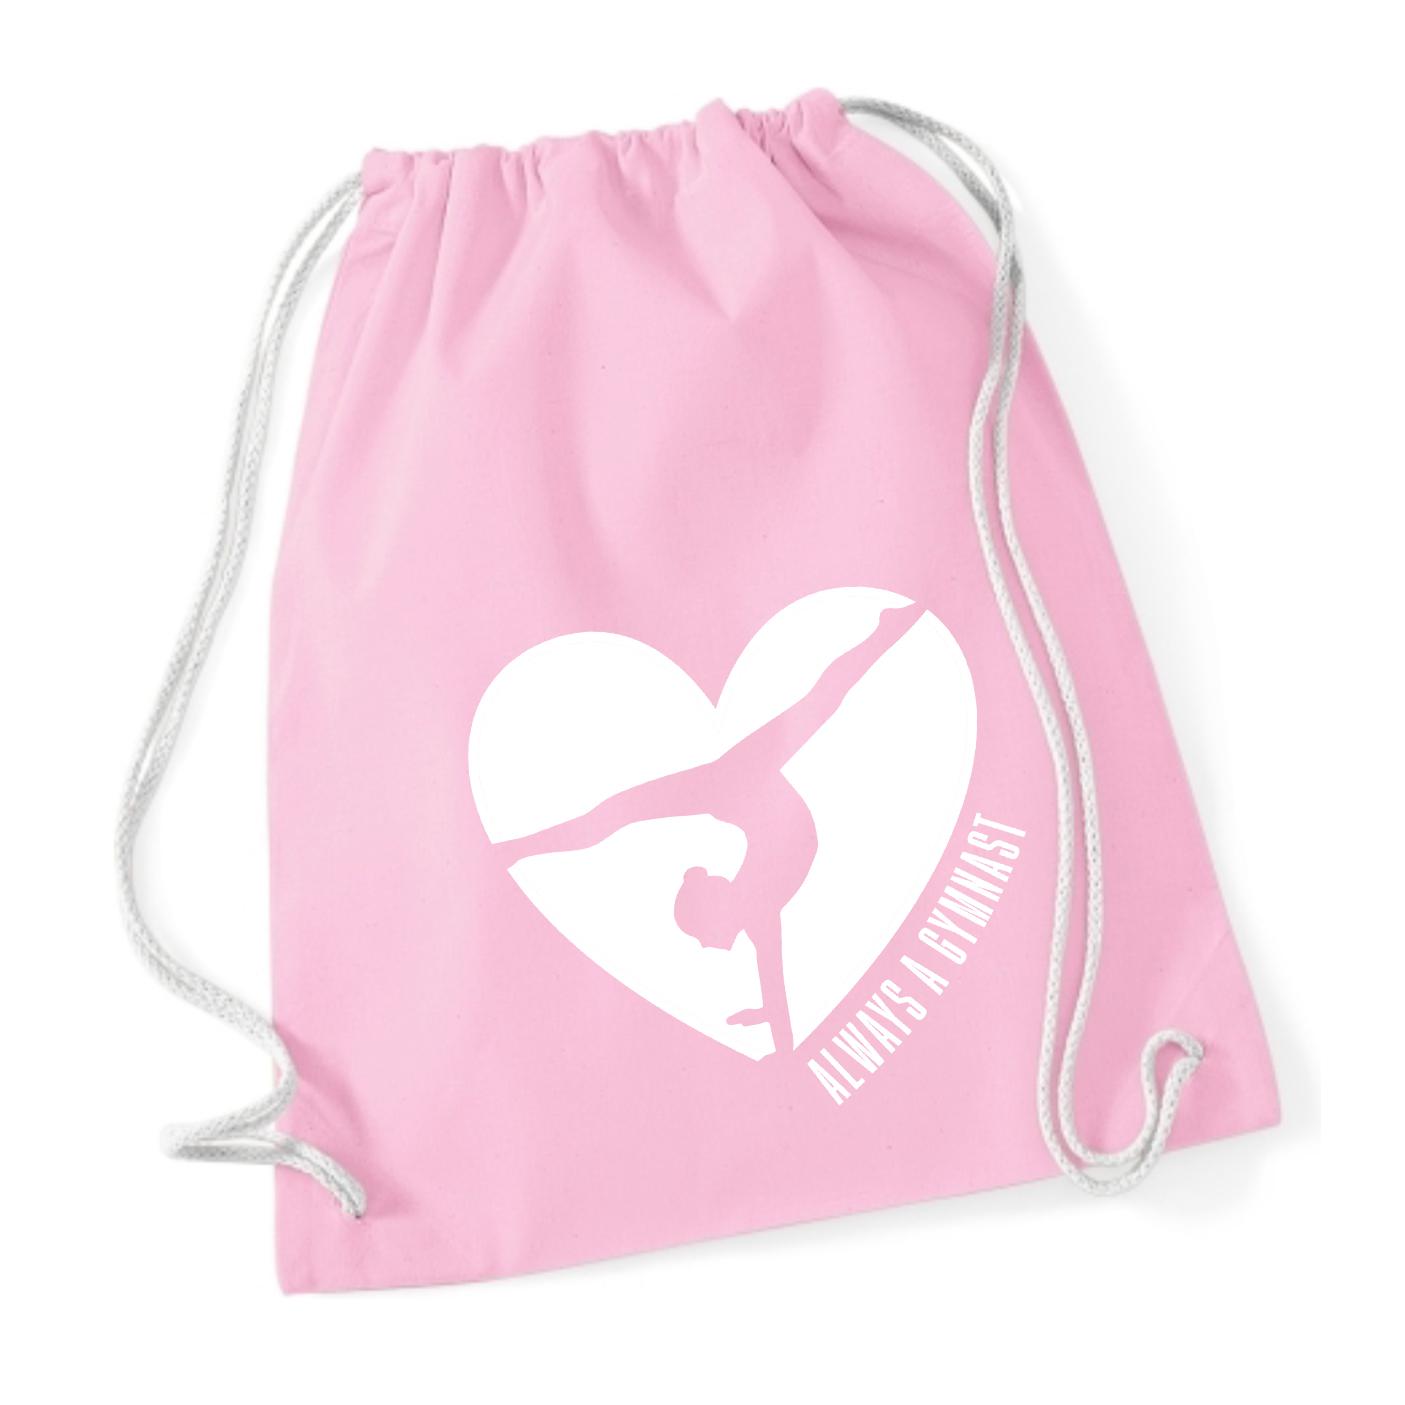 hart-trektas-gymnast-roze